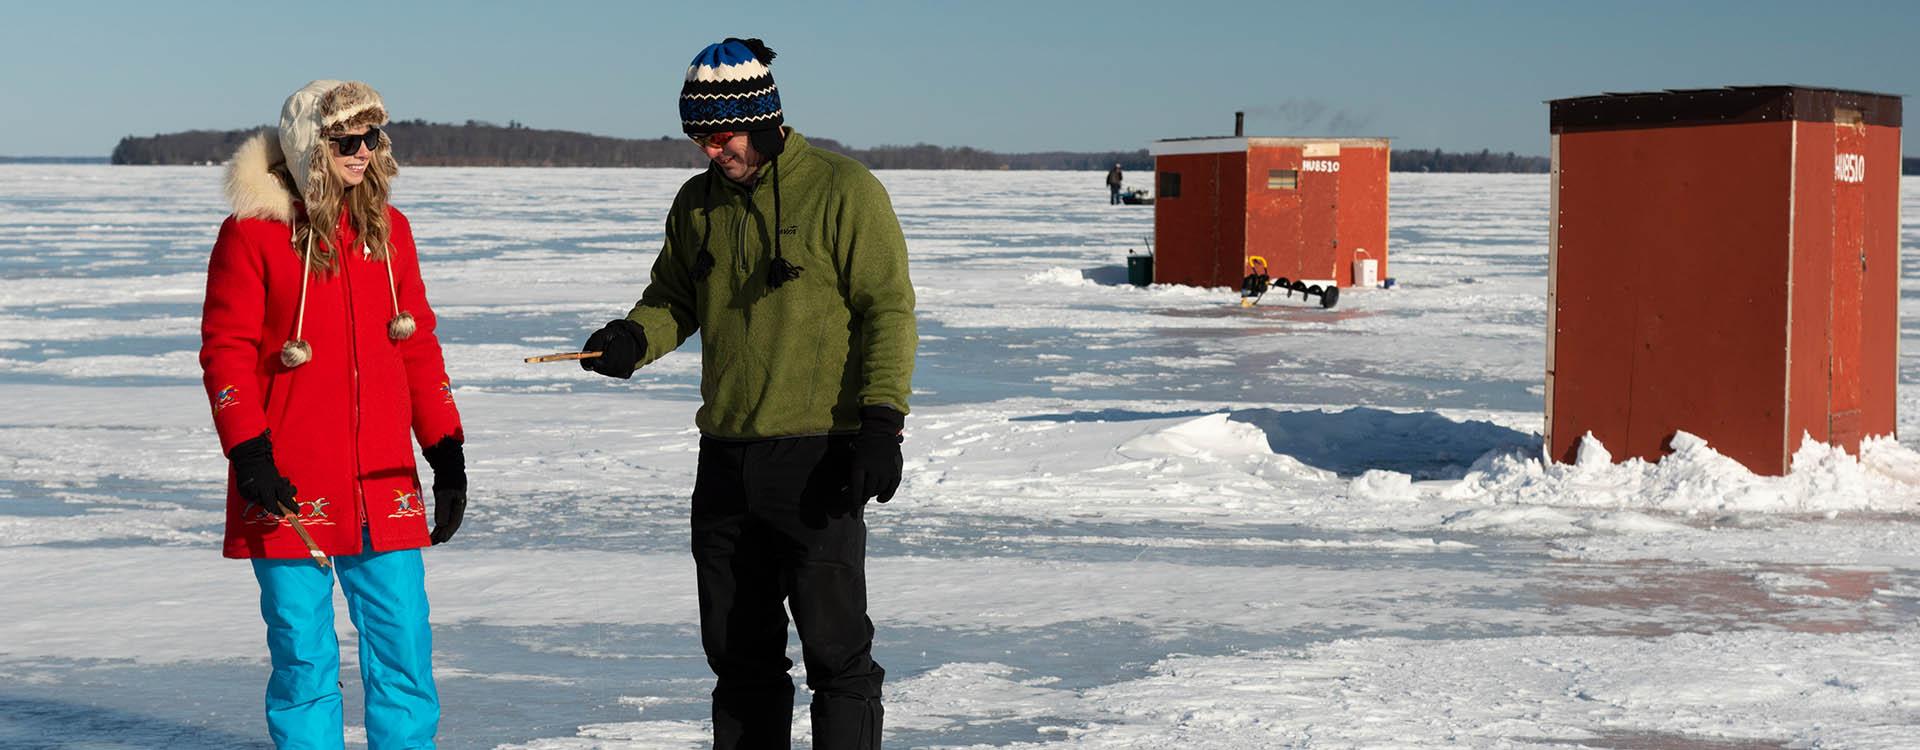 Banner Blog Orillia Fishing - Winter In Orillia